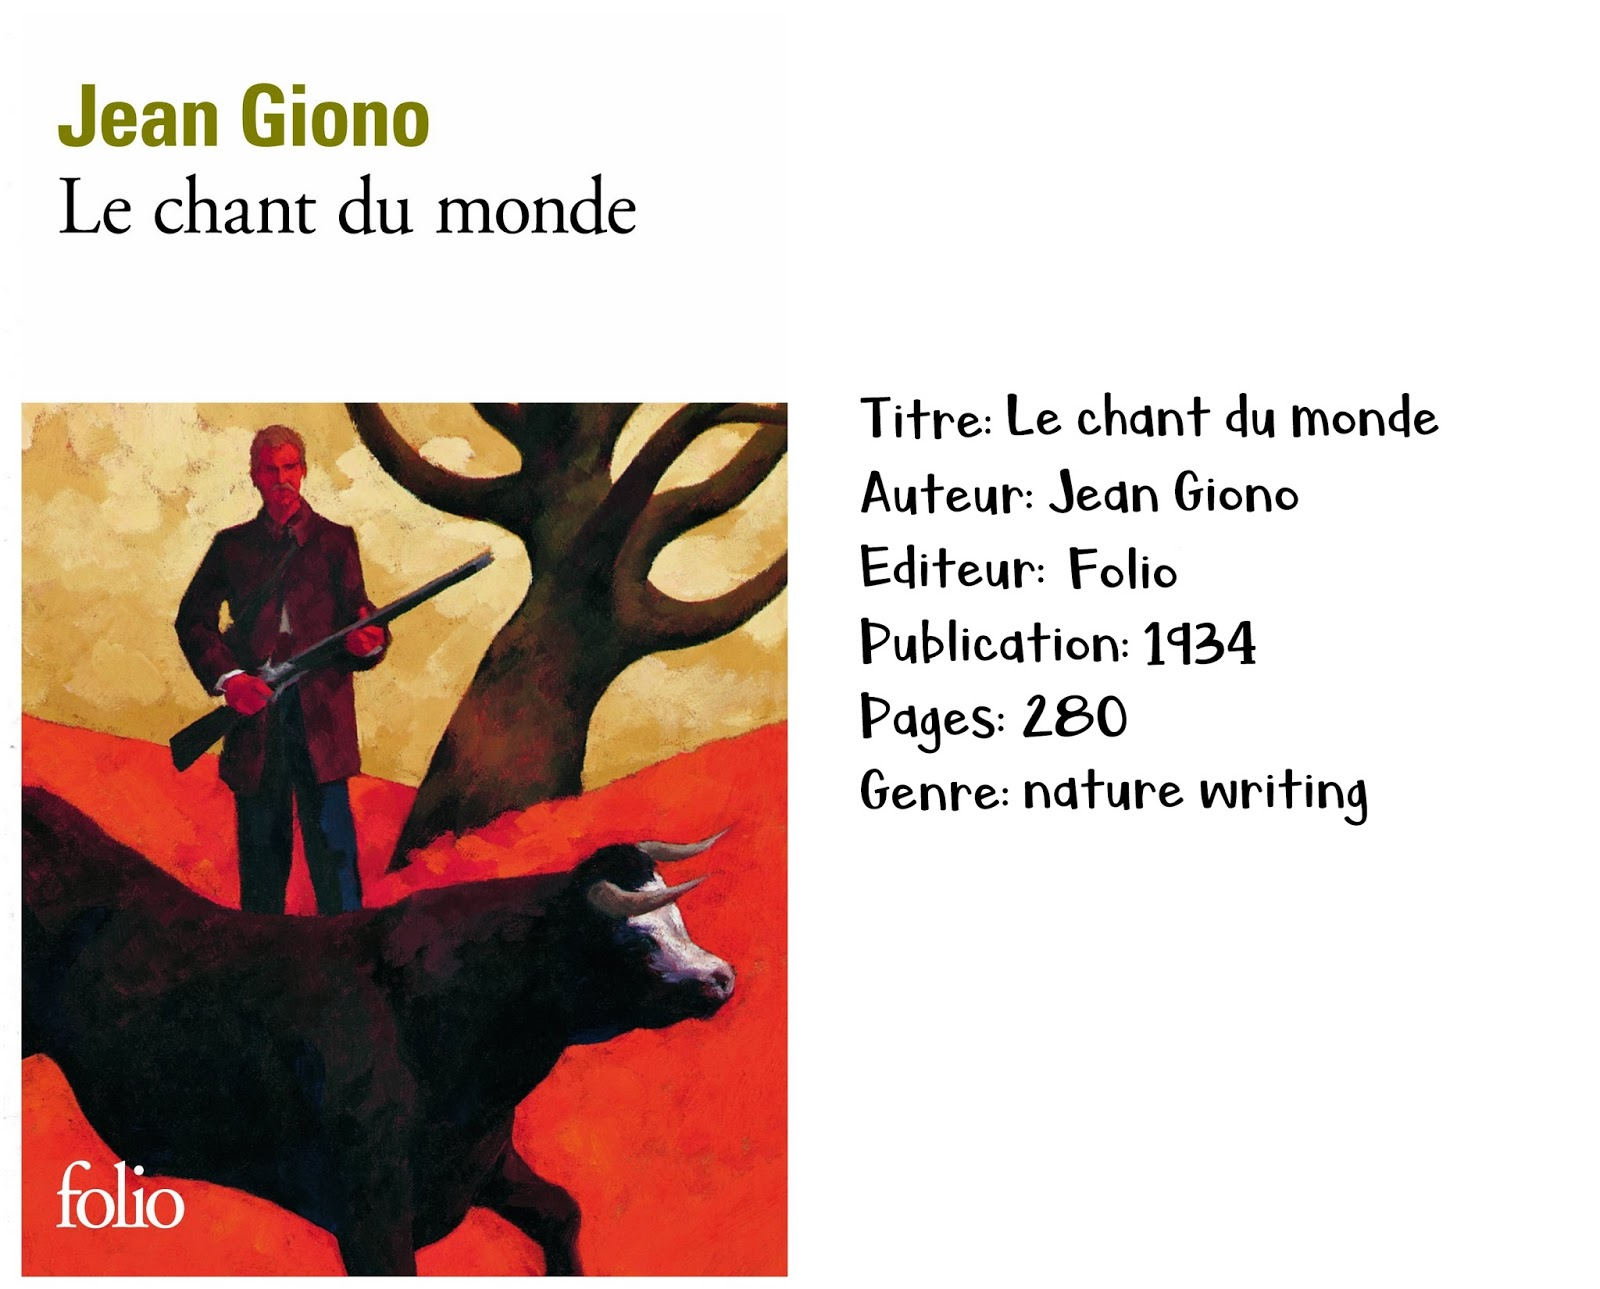 Le chant du monde de Jean Giono